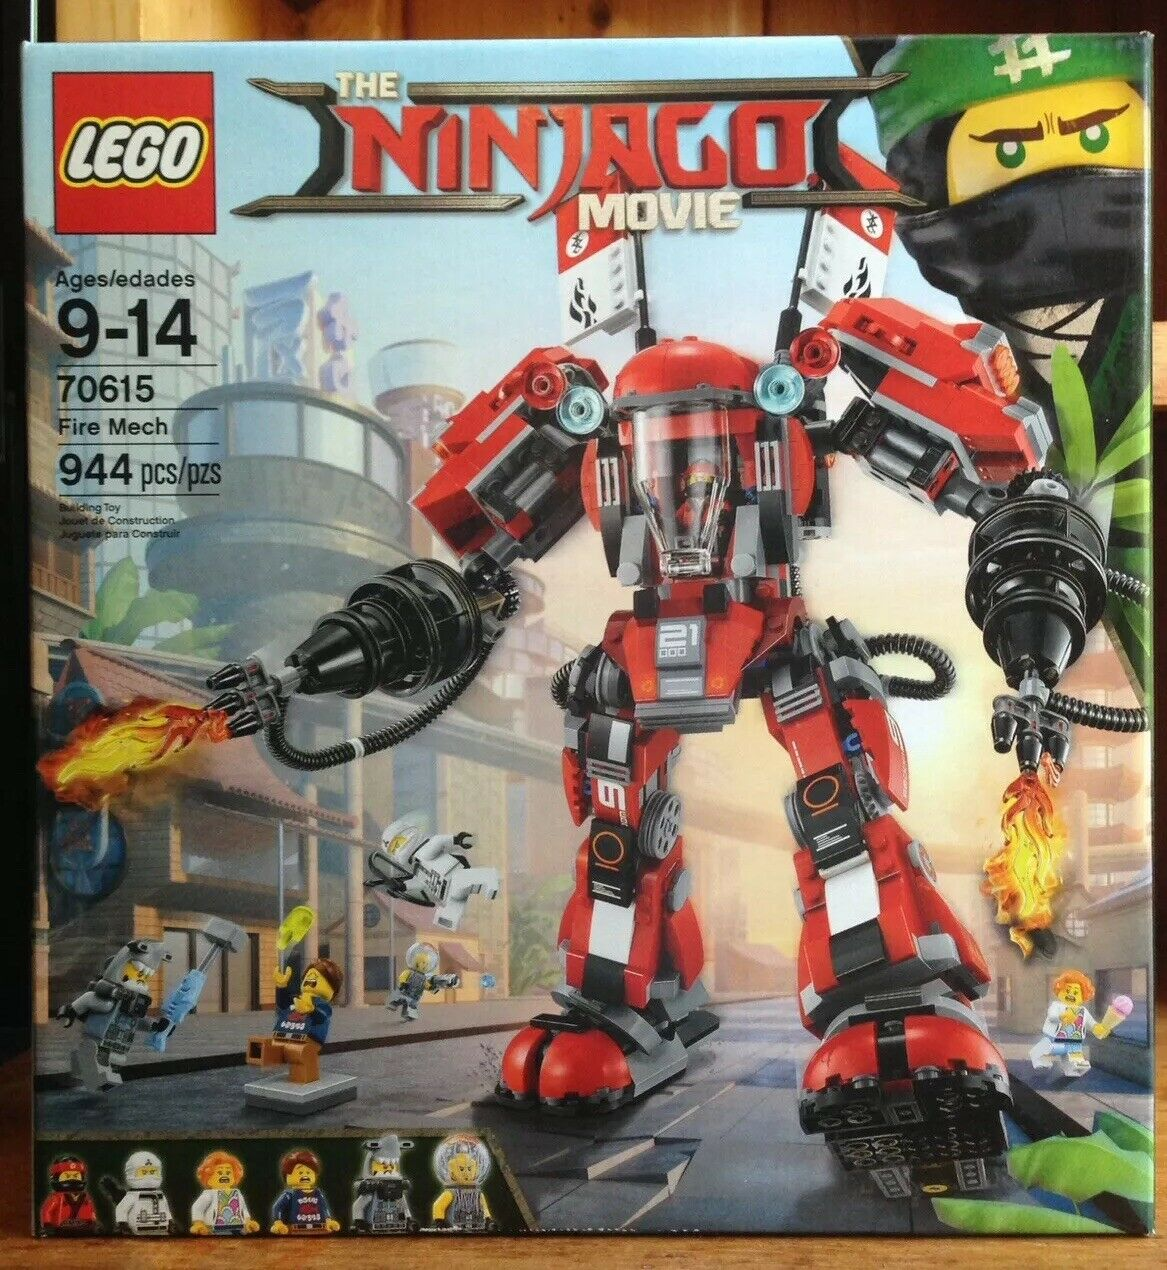 LEGO Ninjago Movie 70615 Fire Mech 944 Pieces New Sealed